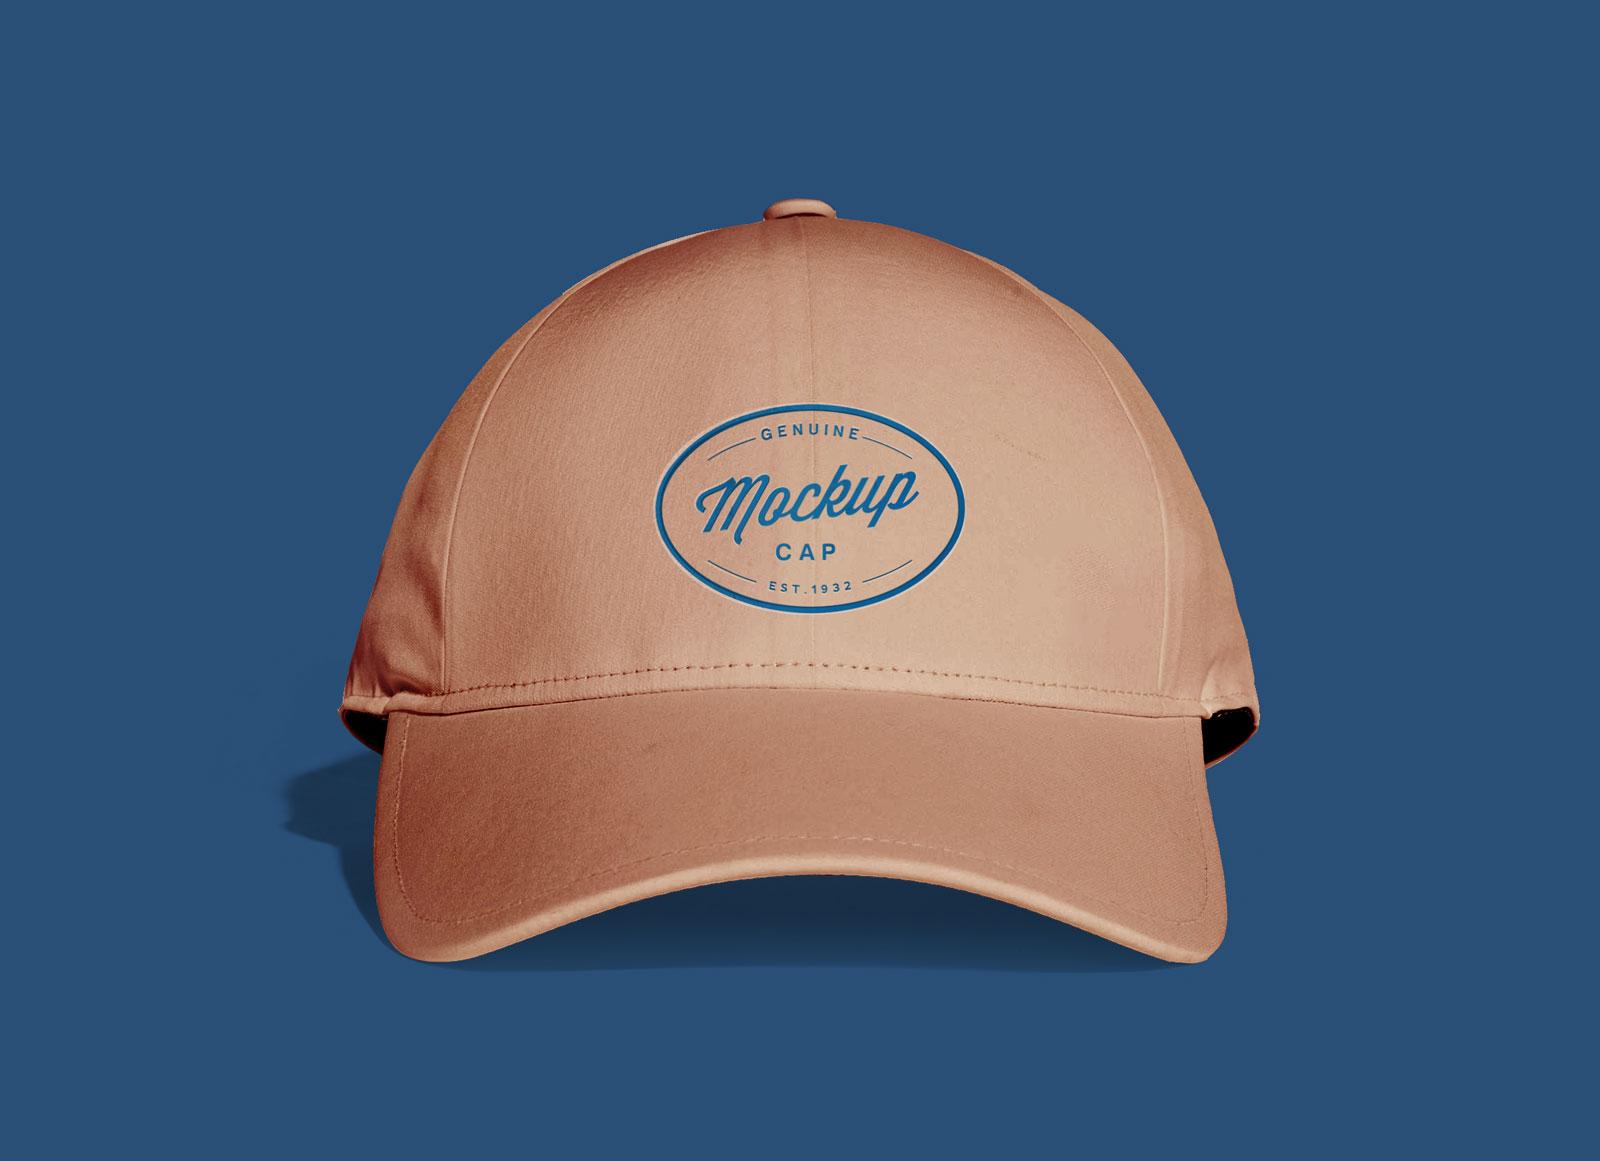 Free-High-Quality-Baseball-Cap-Mockup-PSD